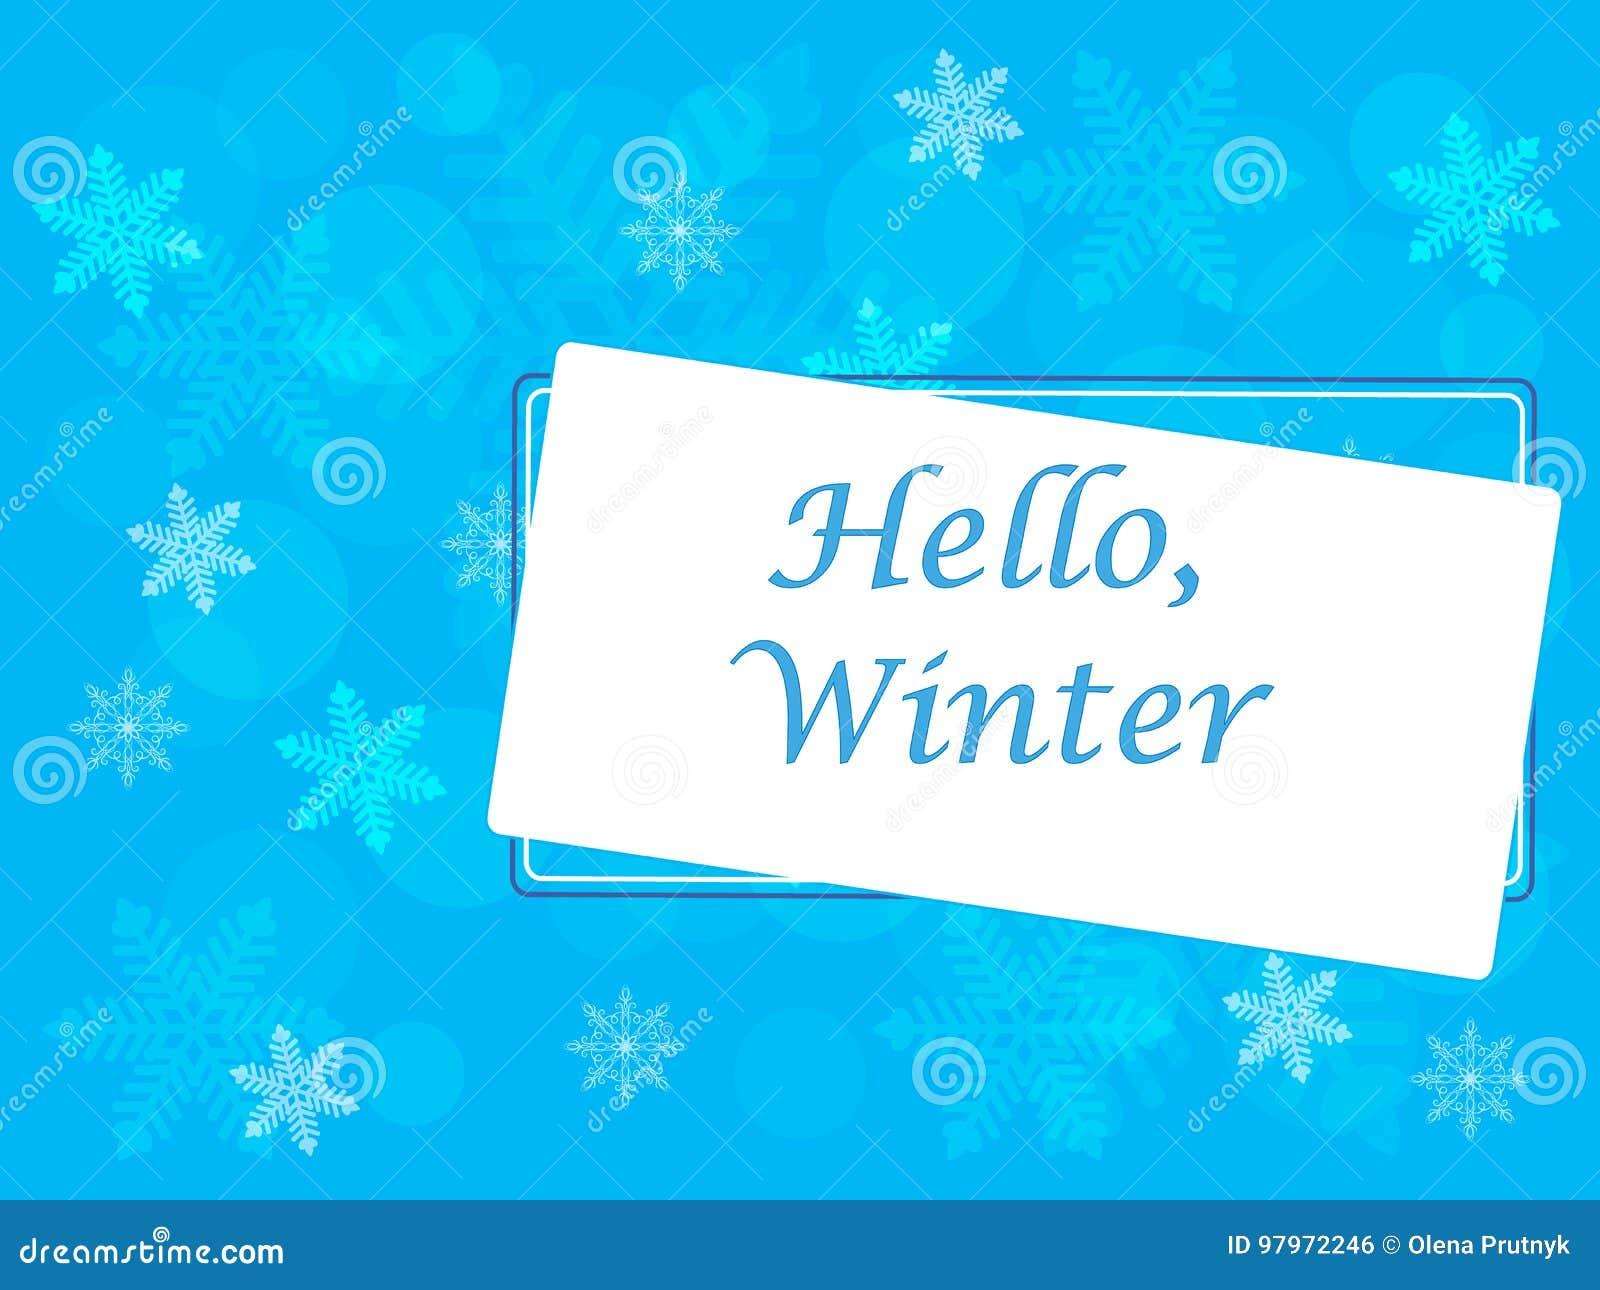 Winter vector picture